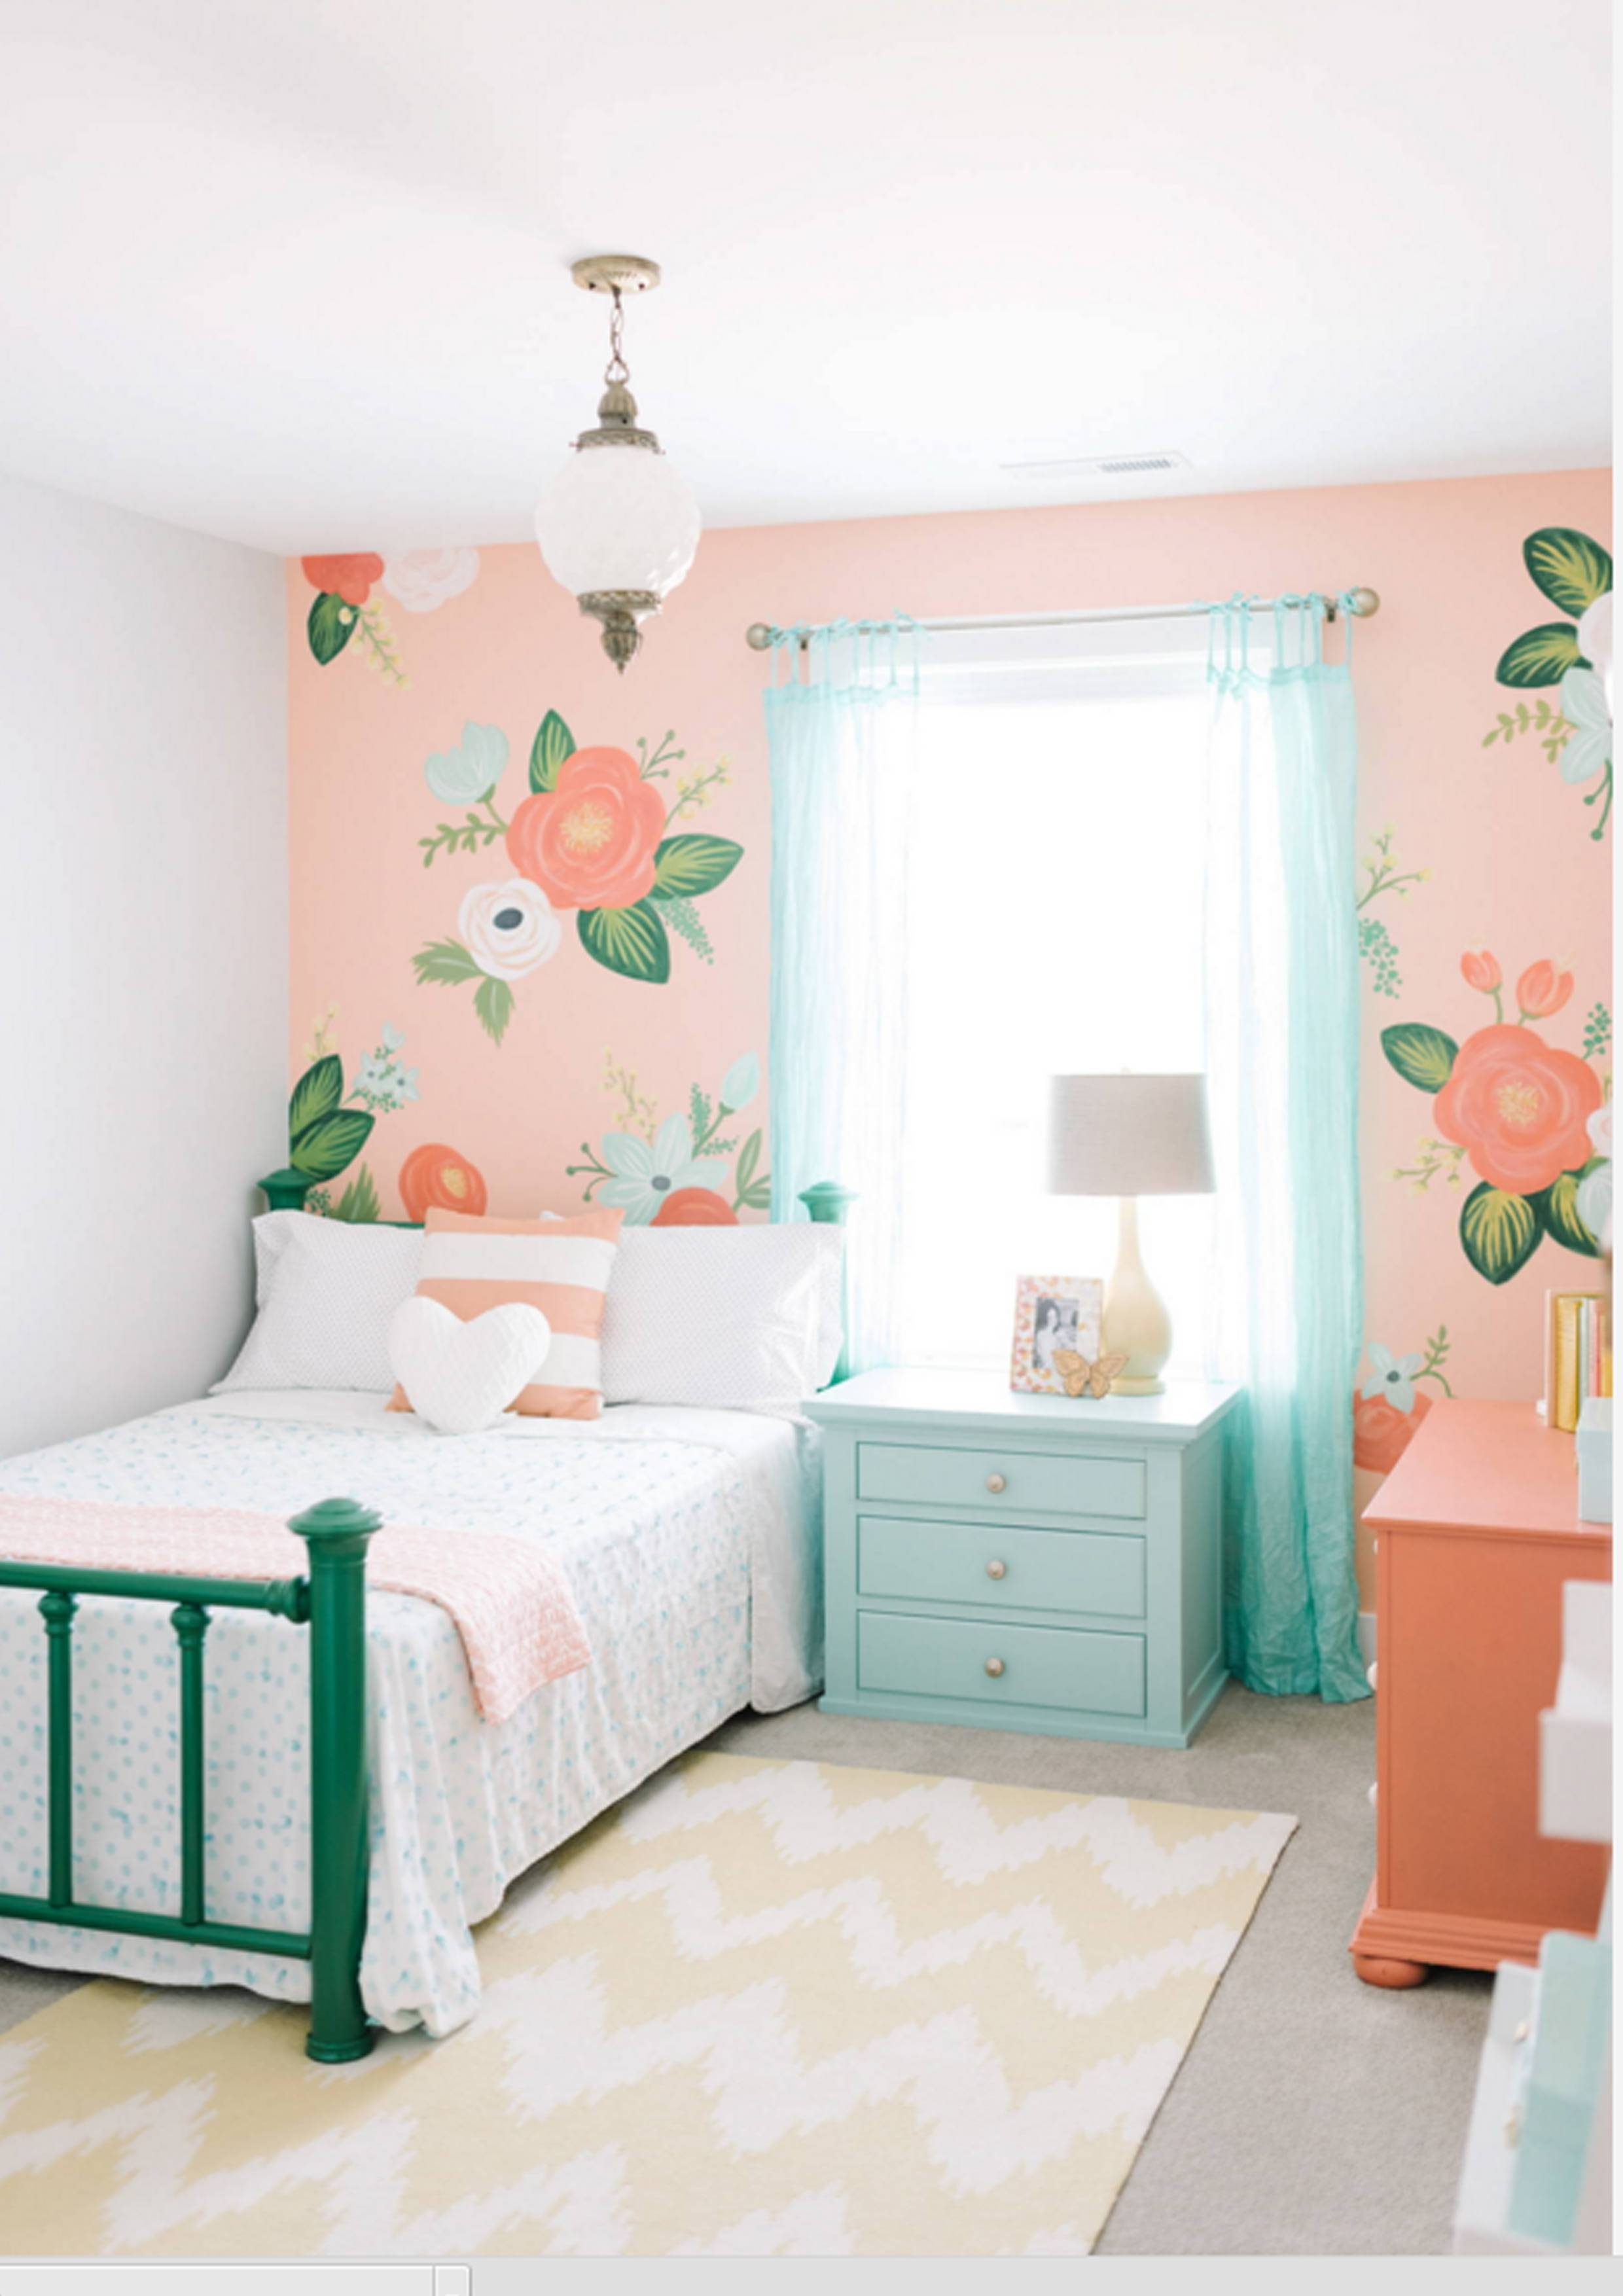 Bedroom : Master Bedroom Colors 3d Wall Art Affordable Wall Art Within Recent Bedroom 3d Wall Art (View 17 of 20)